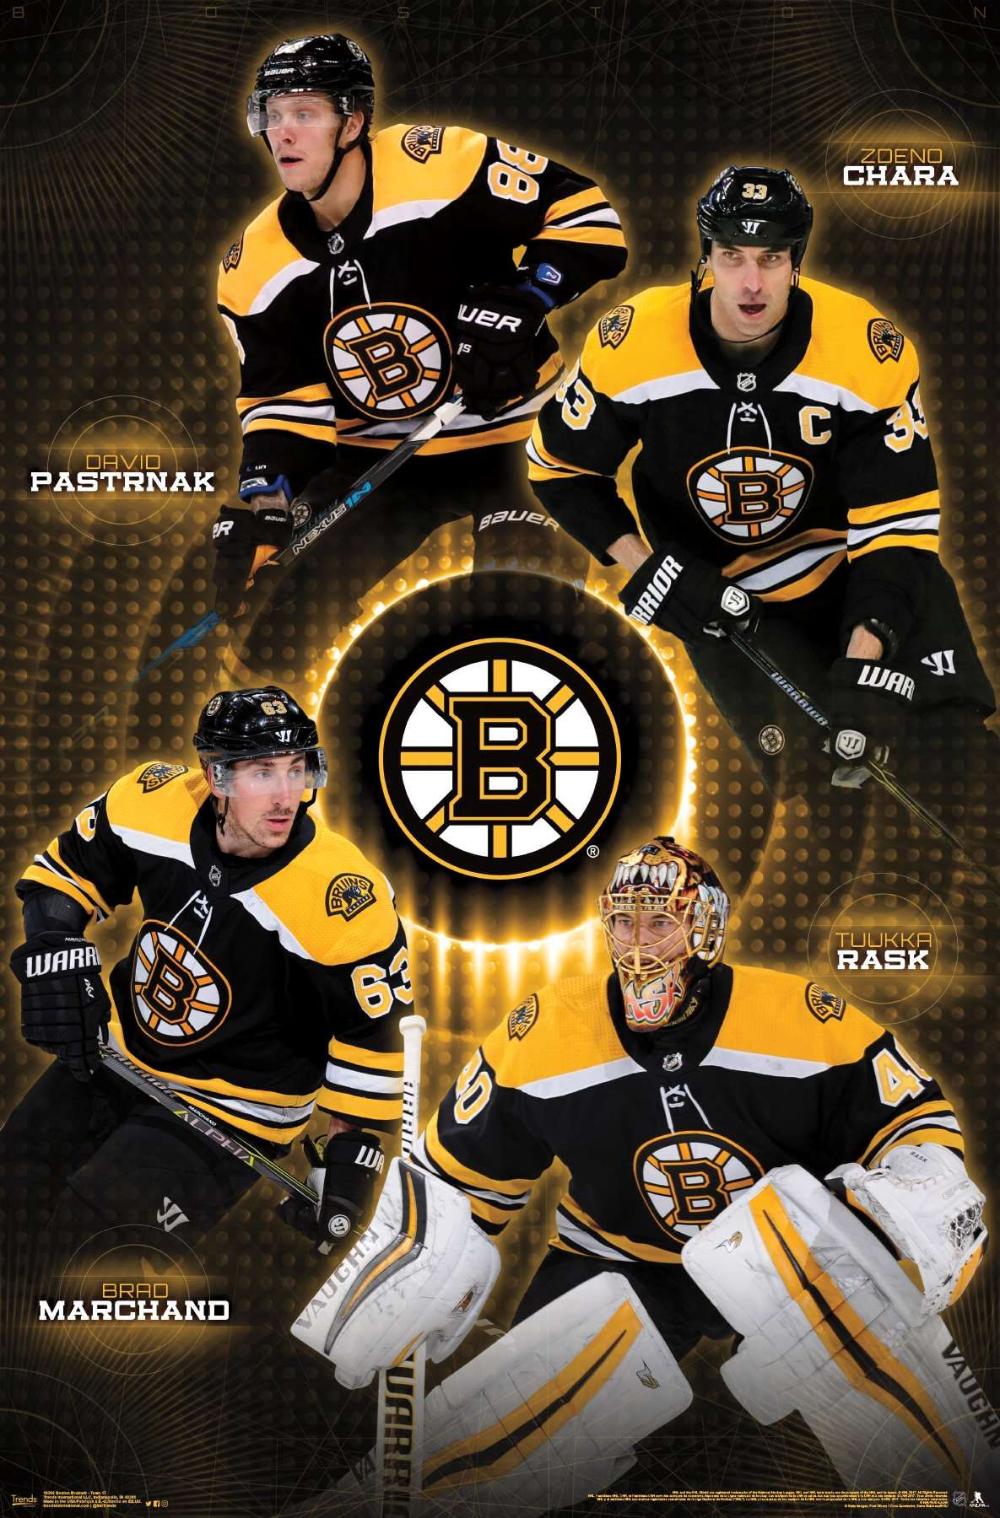 Nhl Boston Bruins Team 17 Nhl Boston Bruins Boston Bruins Boston Bruins Hockey